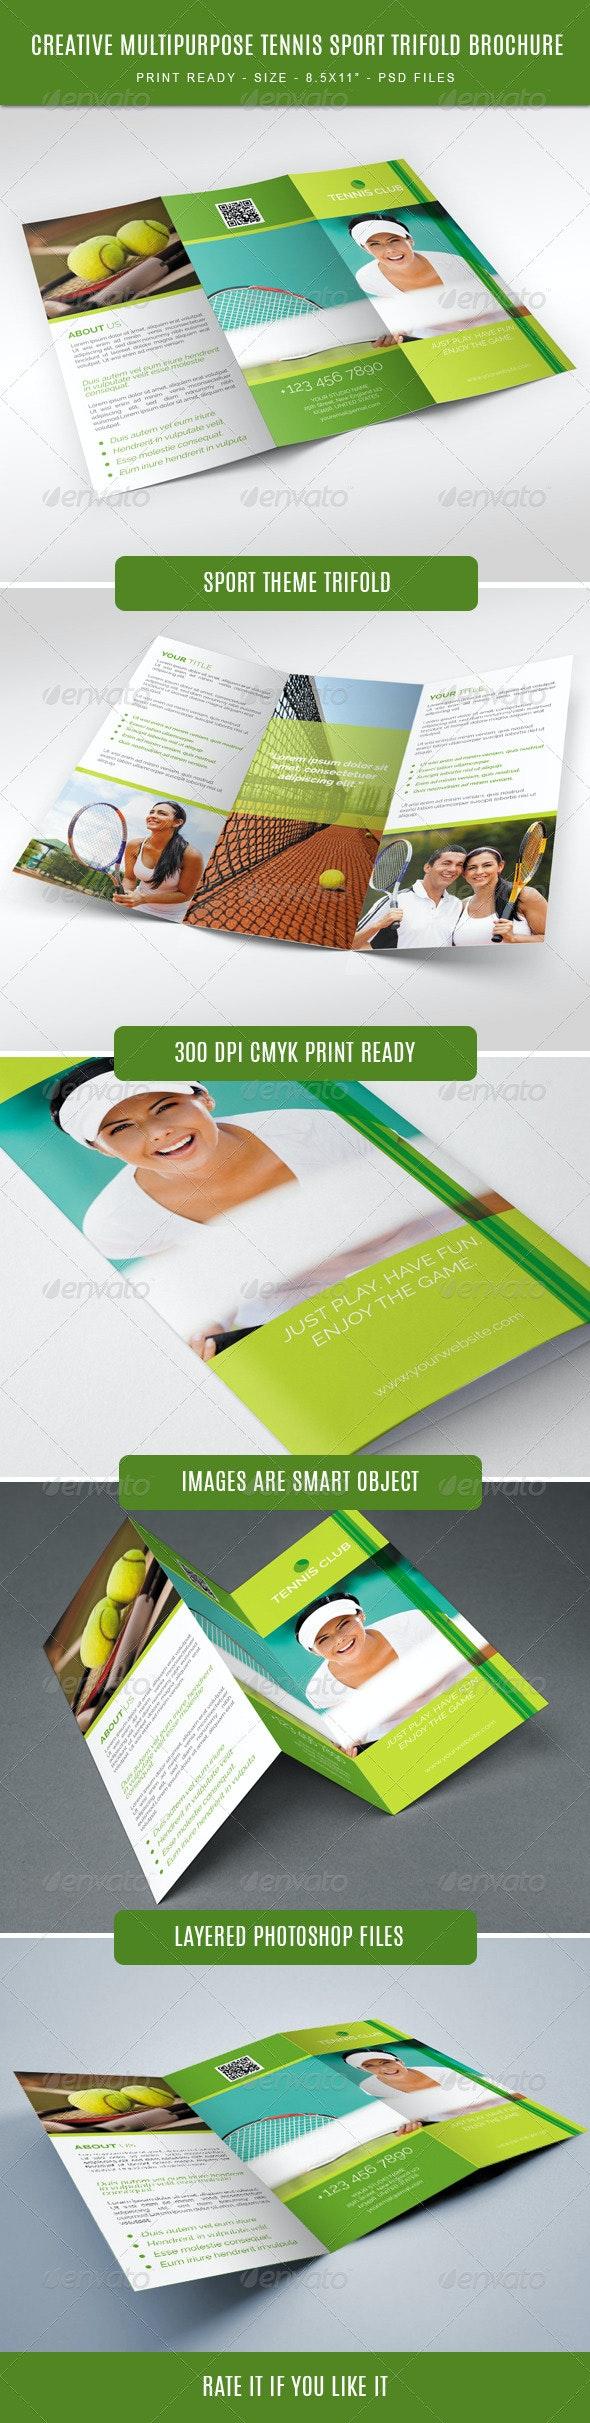 Tennis Club Trifold Brochure - Brochures Print Templates